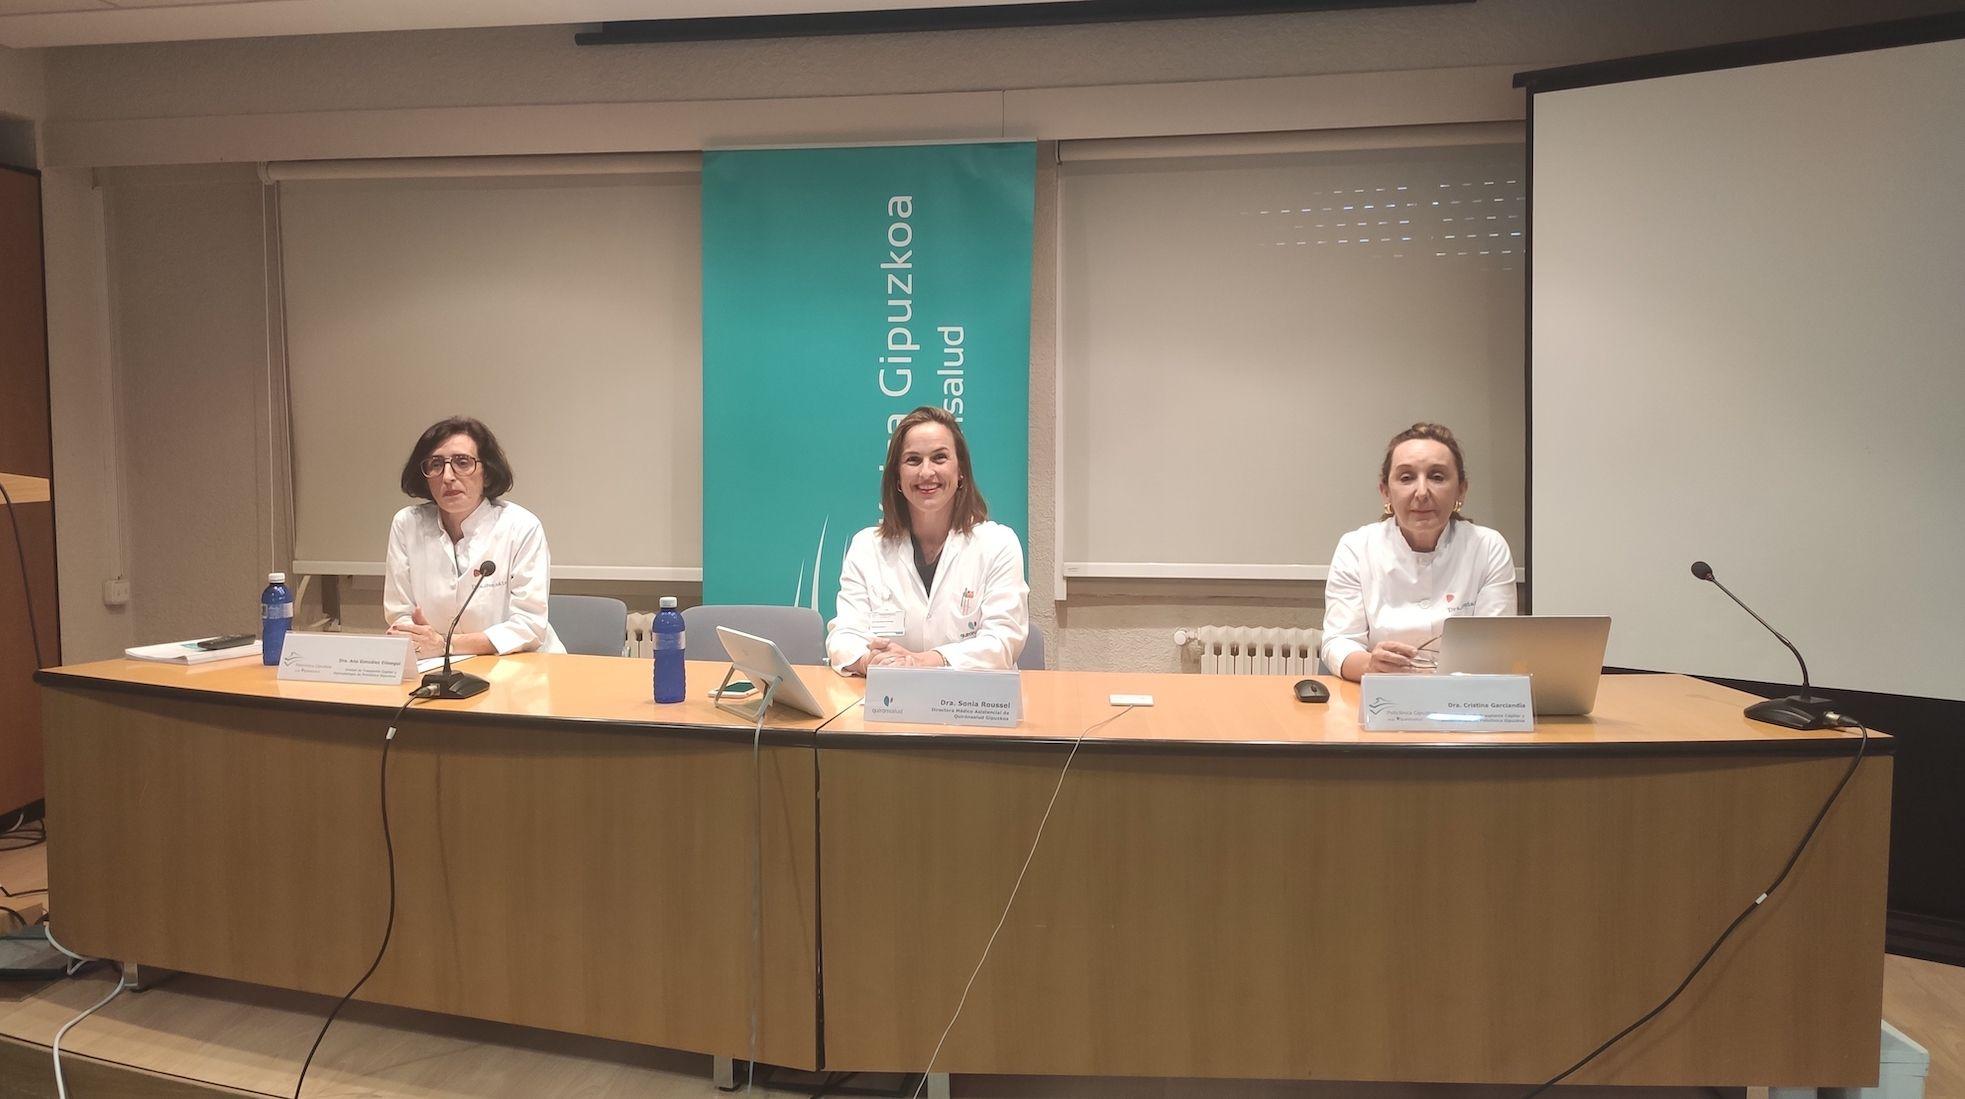 Foto de Las doctoras Ana González Elosegui, Sonia Roussel y Cristina